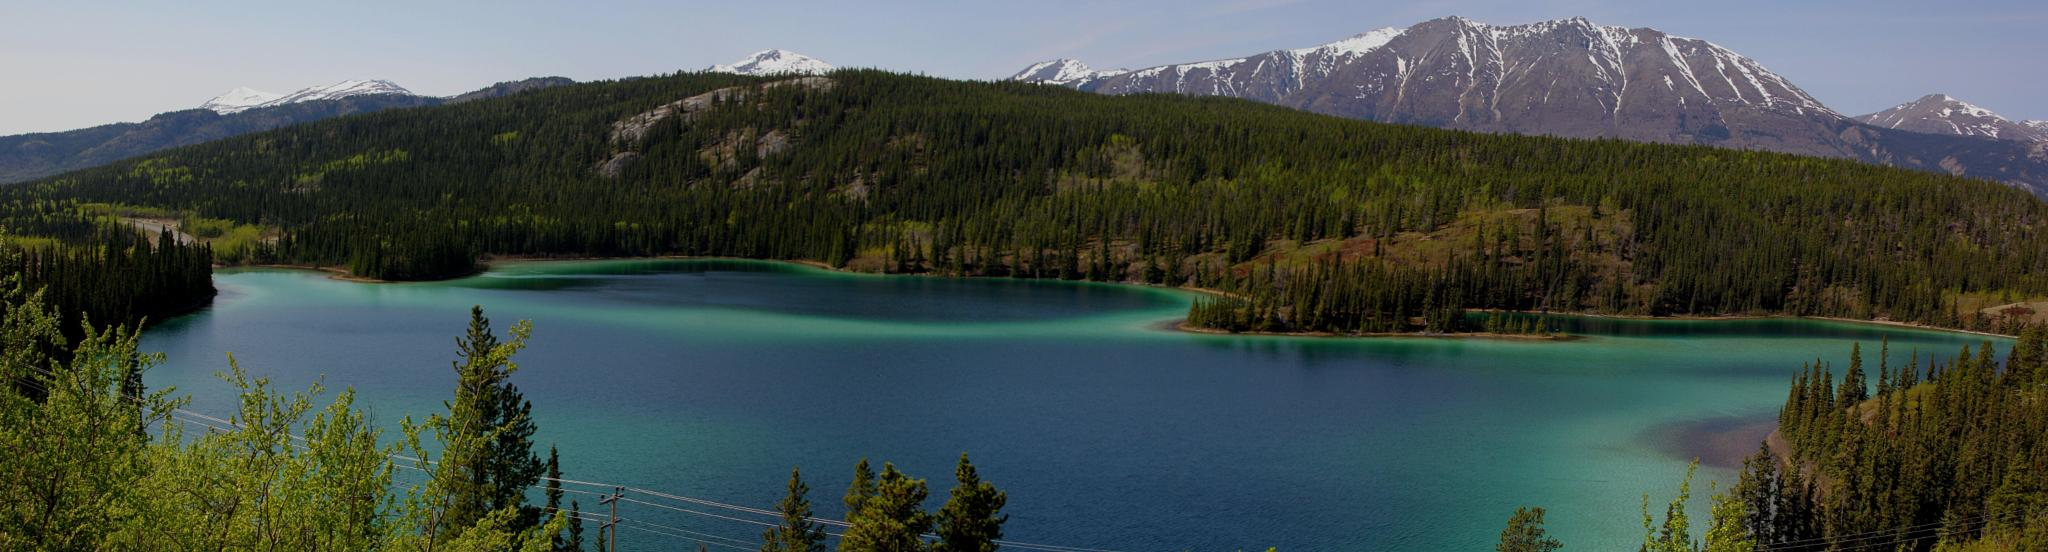 Emerald Lake, Yukon by Marv & Beth Russell